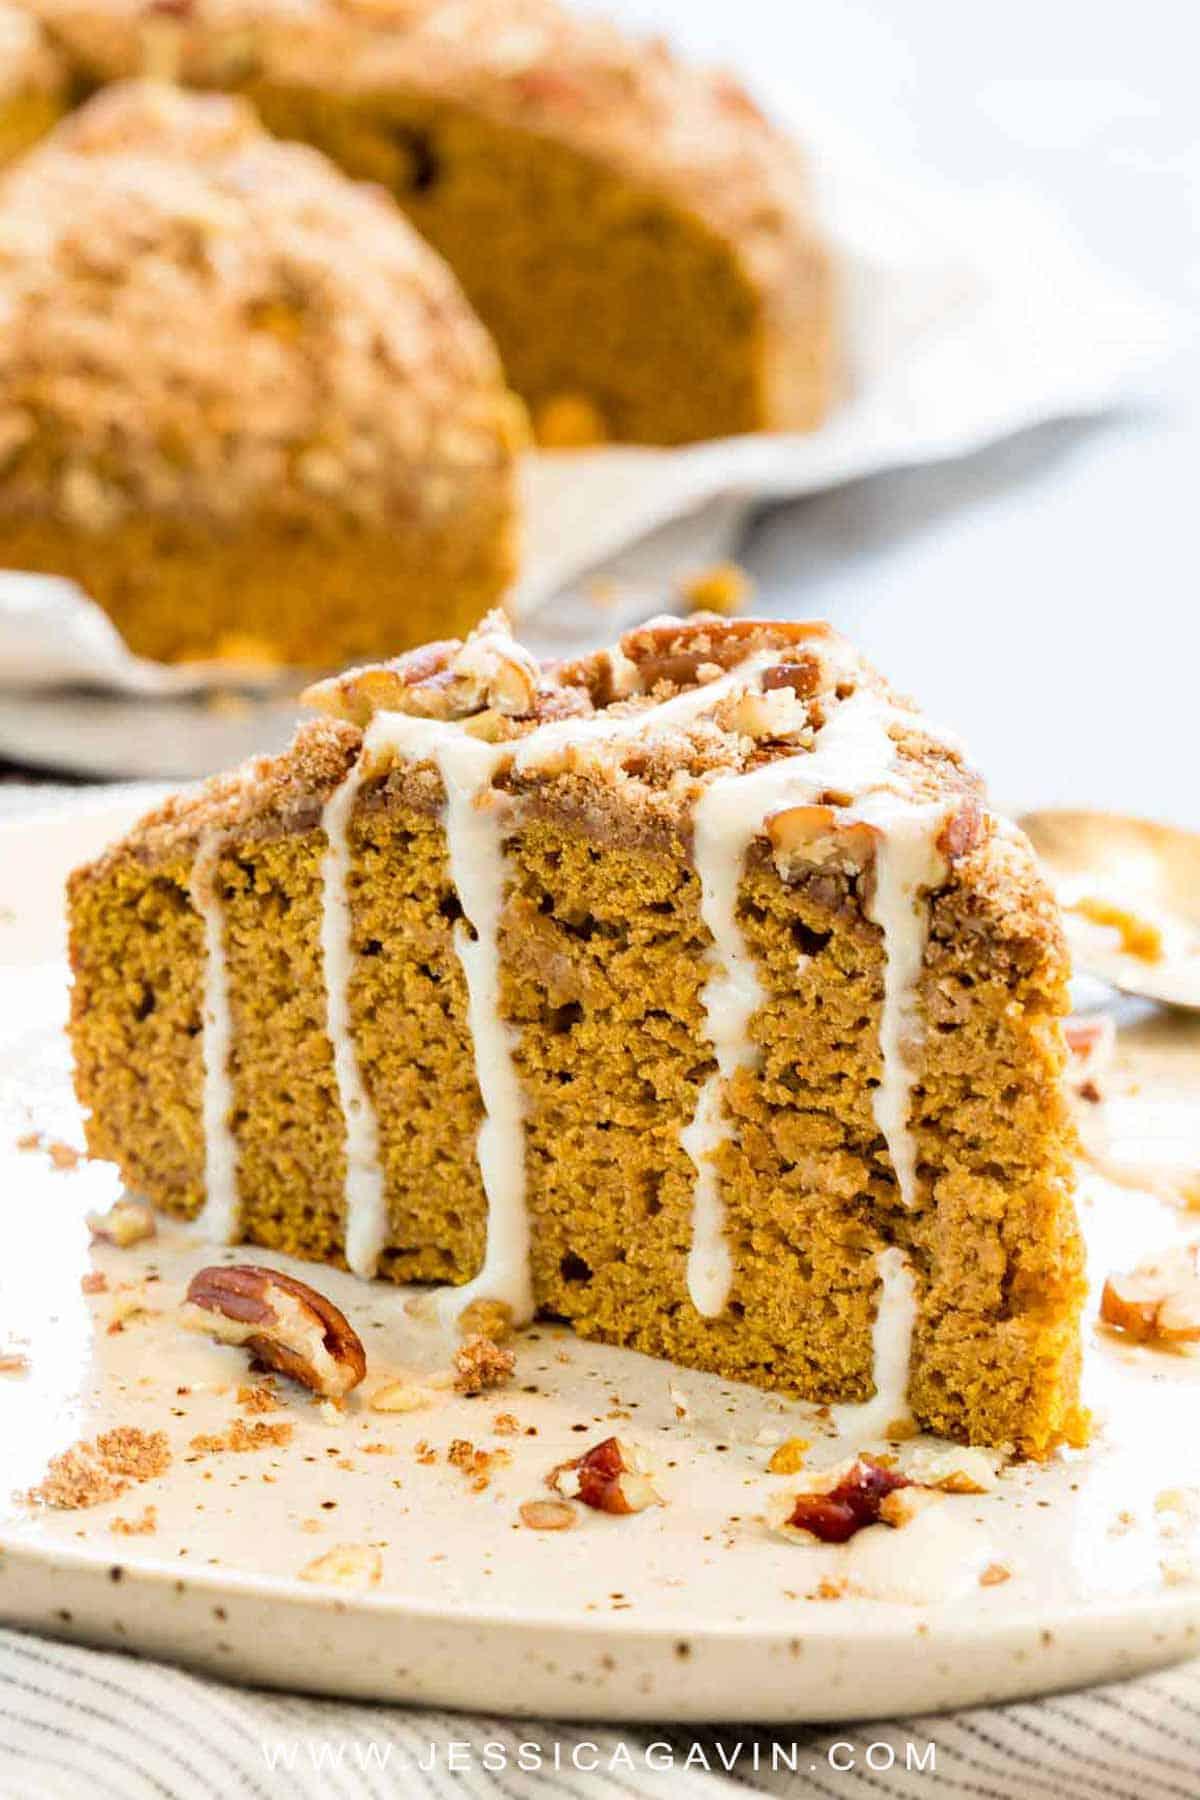 Lightened up pumpkin coffee cake is an easy breakfast treat tofeed a crowd! Each slice packs whole grains, cinnamon, pecans, and pumpkin flavor. #coffecake #breakfast #sweets #pumpkin #fallrecipes